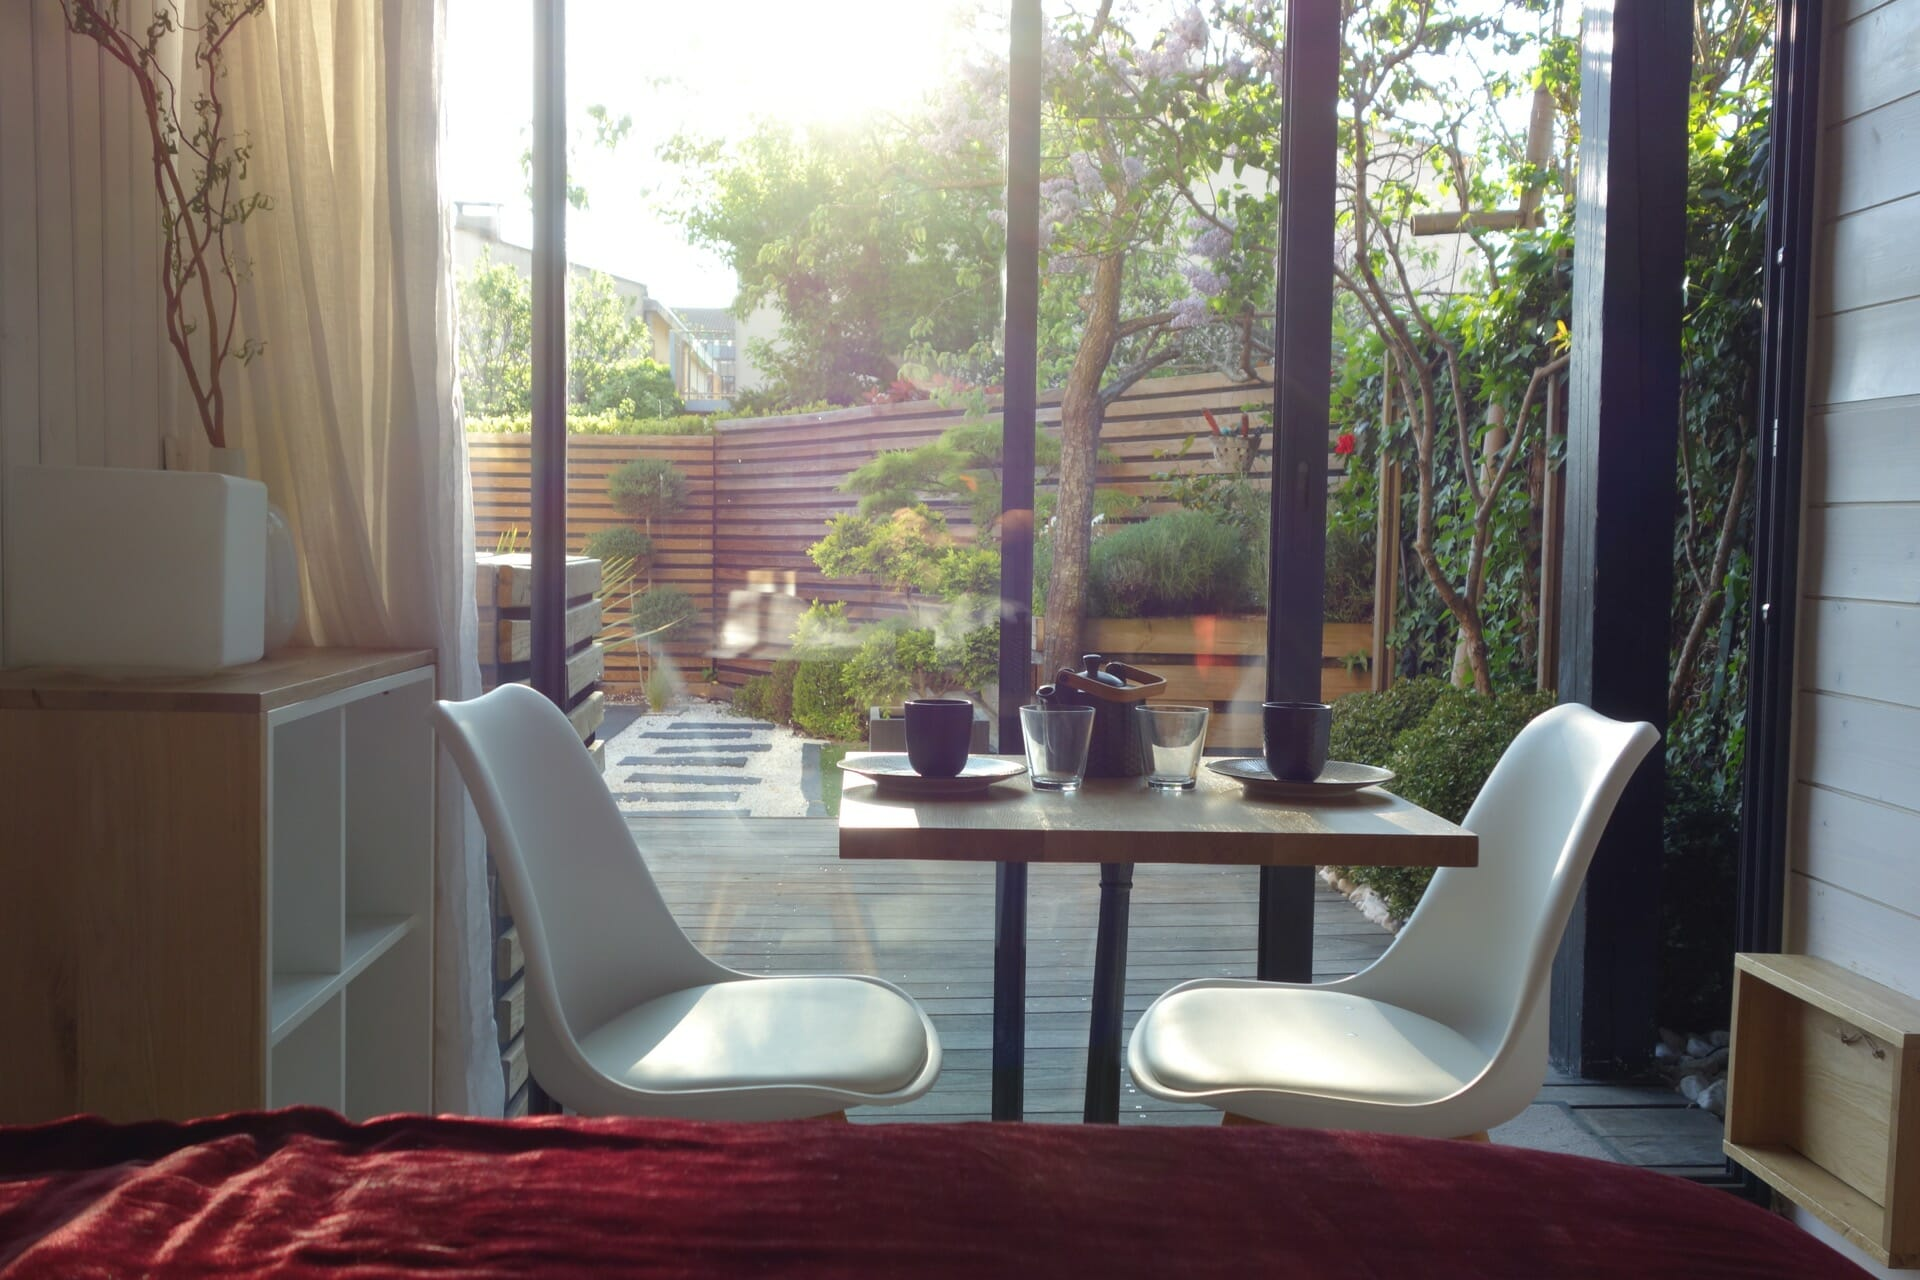 UrbanhouseLife-Toulouse-Purpan